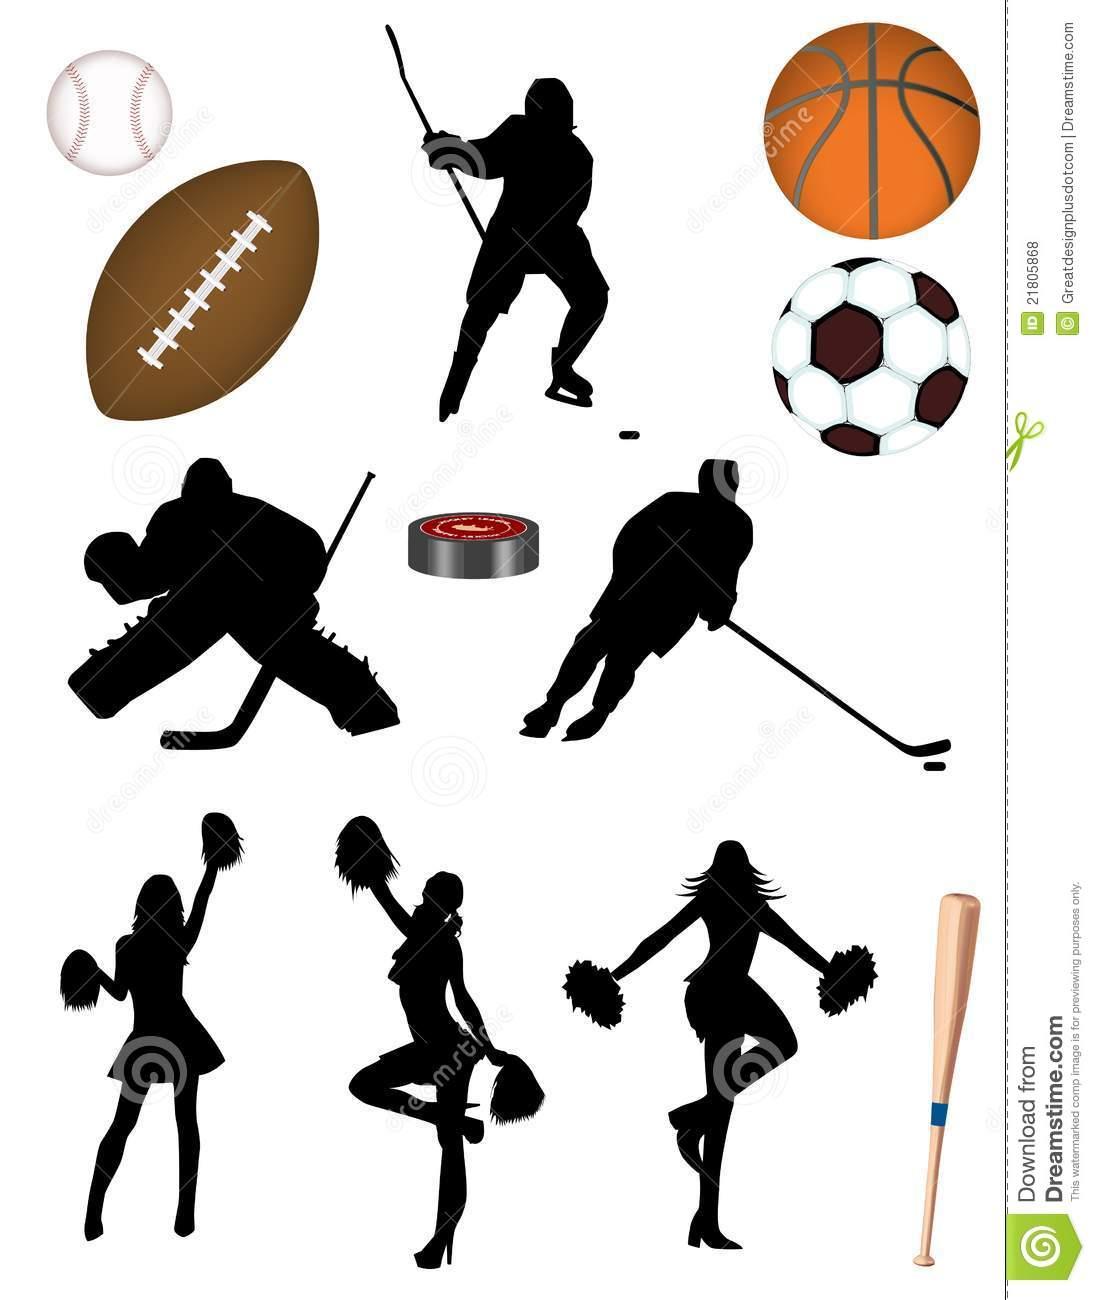 Hockey! Baseball! Basketball! Football! Soccer! Stock Vector.